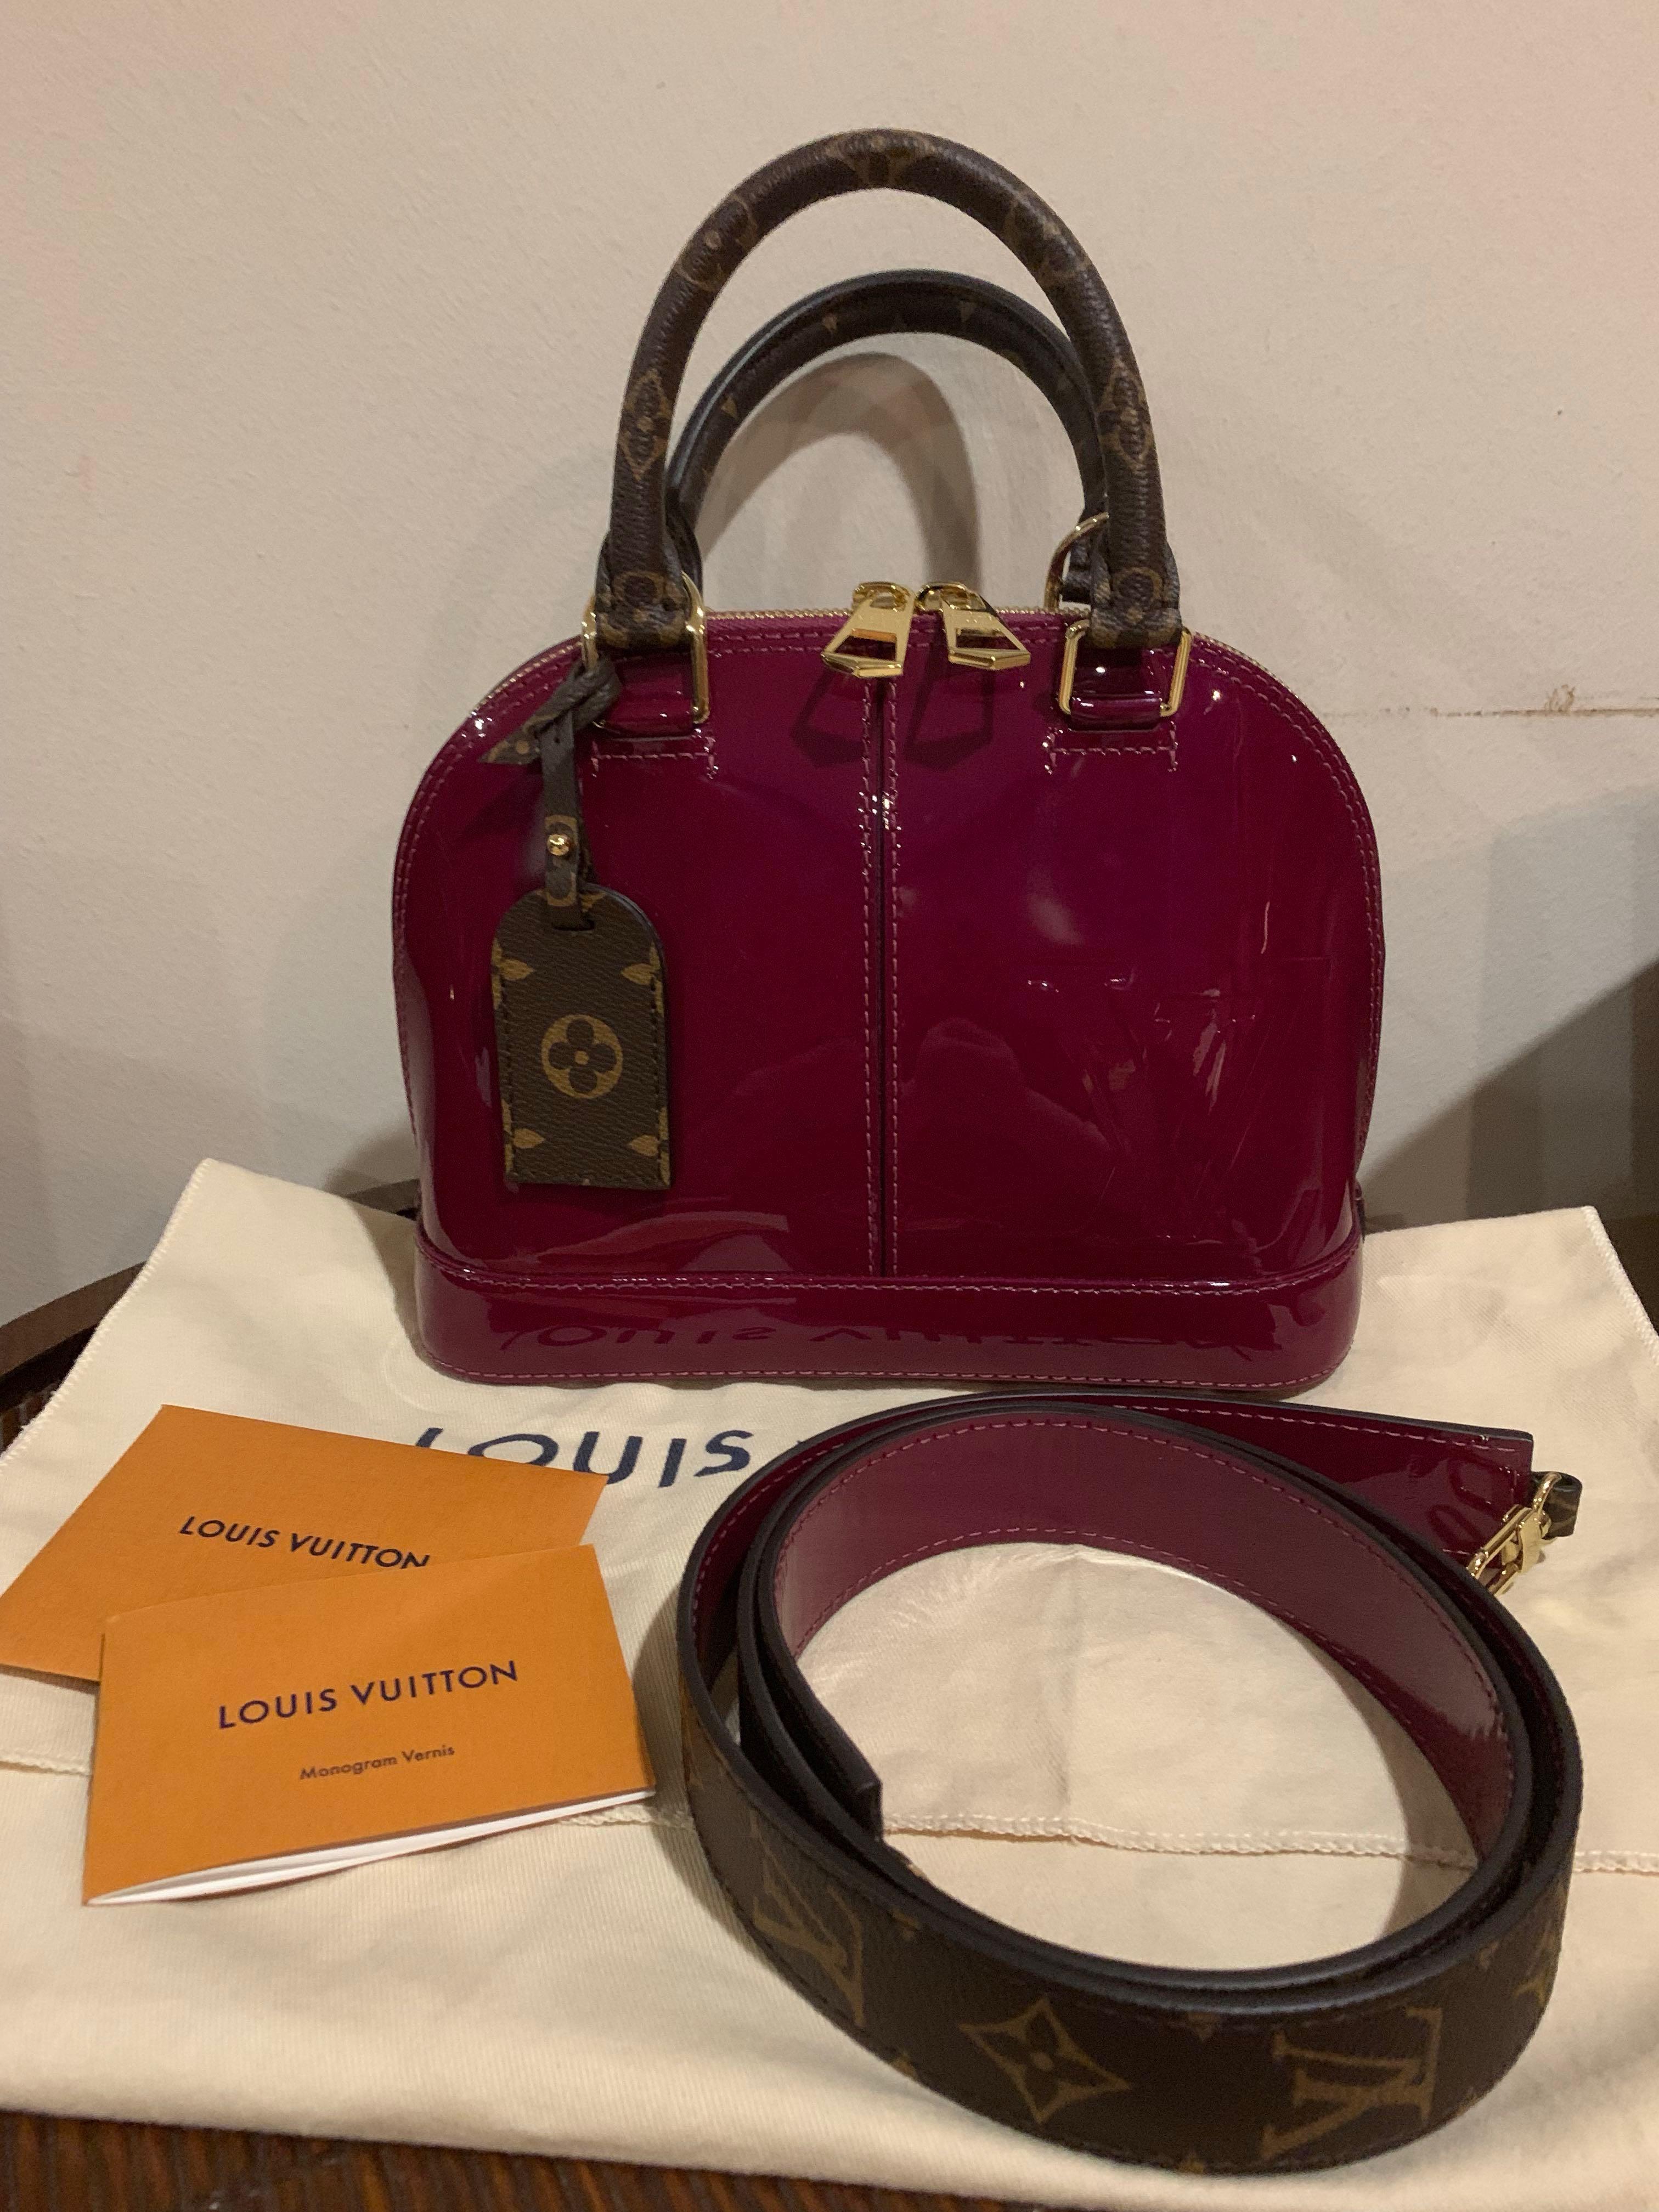 cc8abeec4 Louis Vuitton (LV) Alma BB, Luxury, Bags & Wallets, Handbags on Carousell